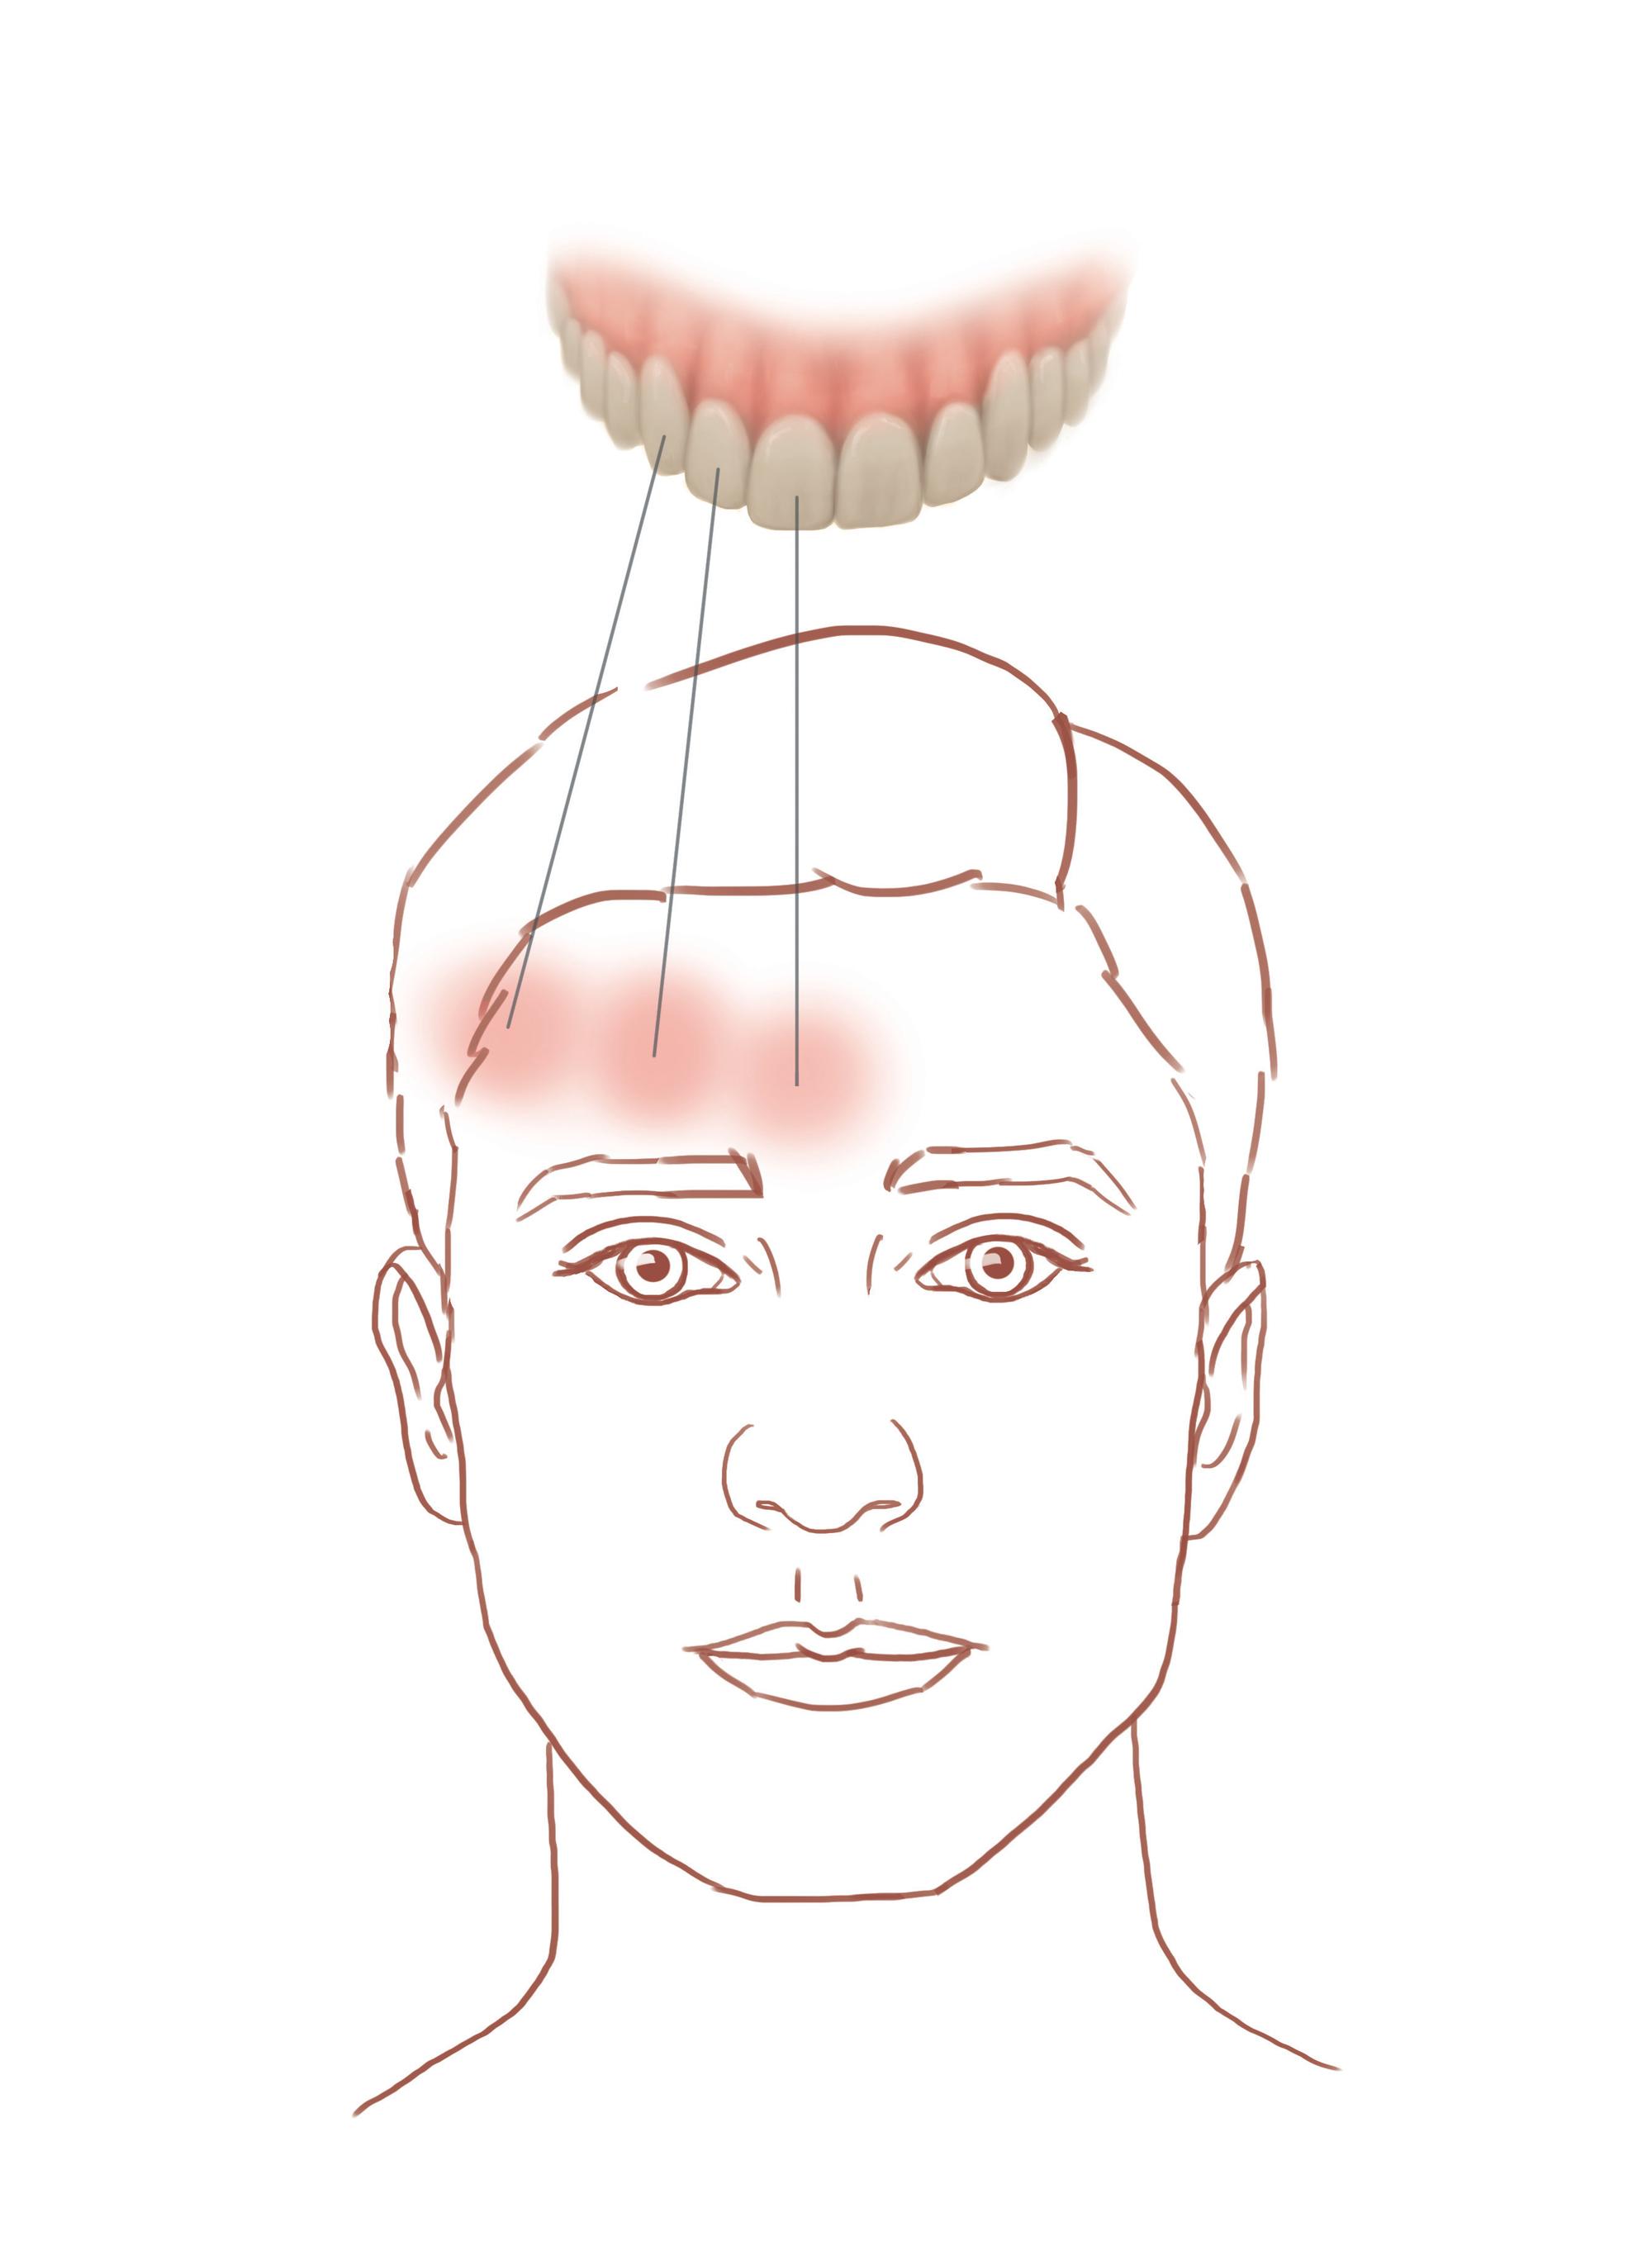 Migraine Tooth Pain